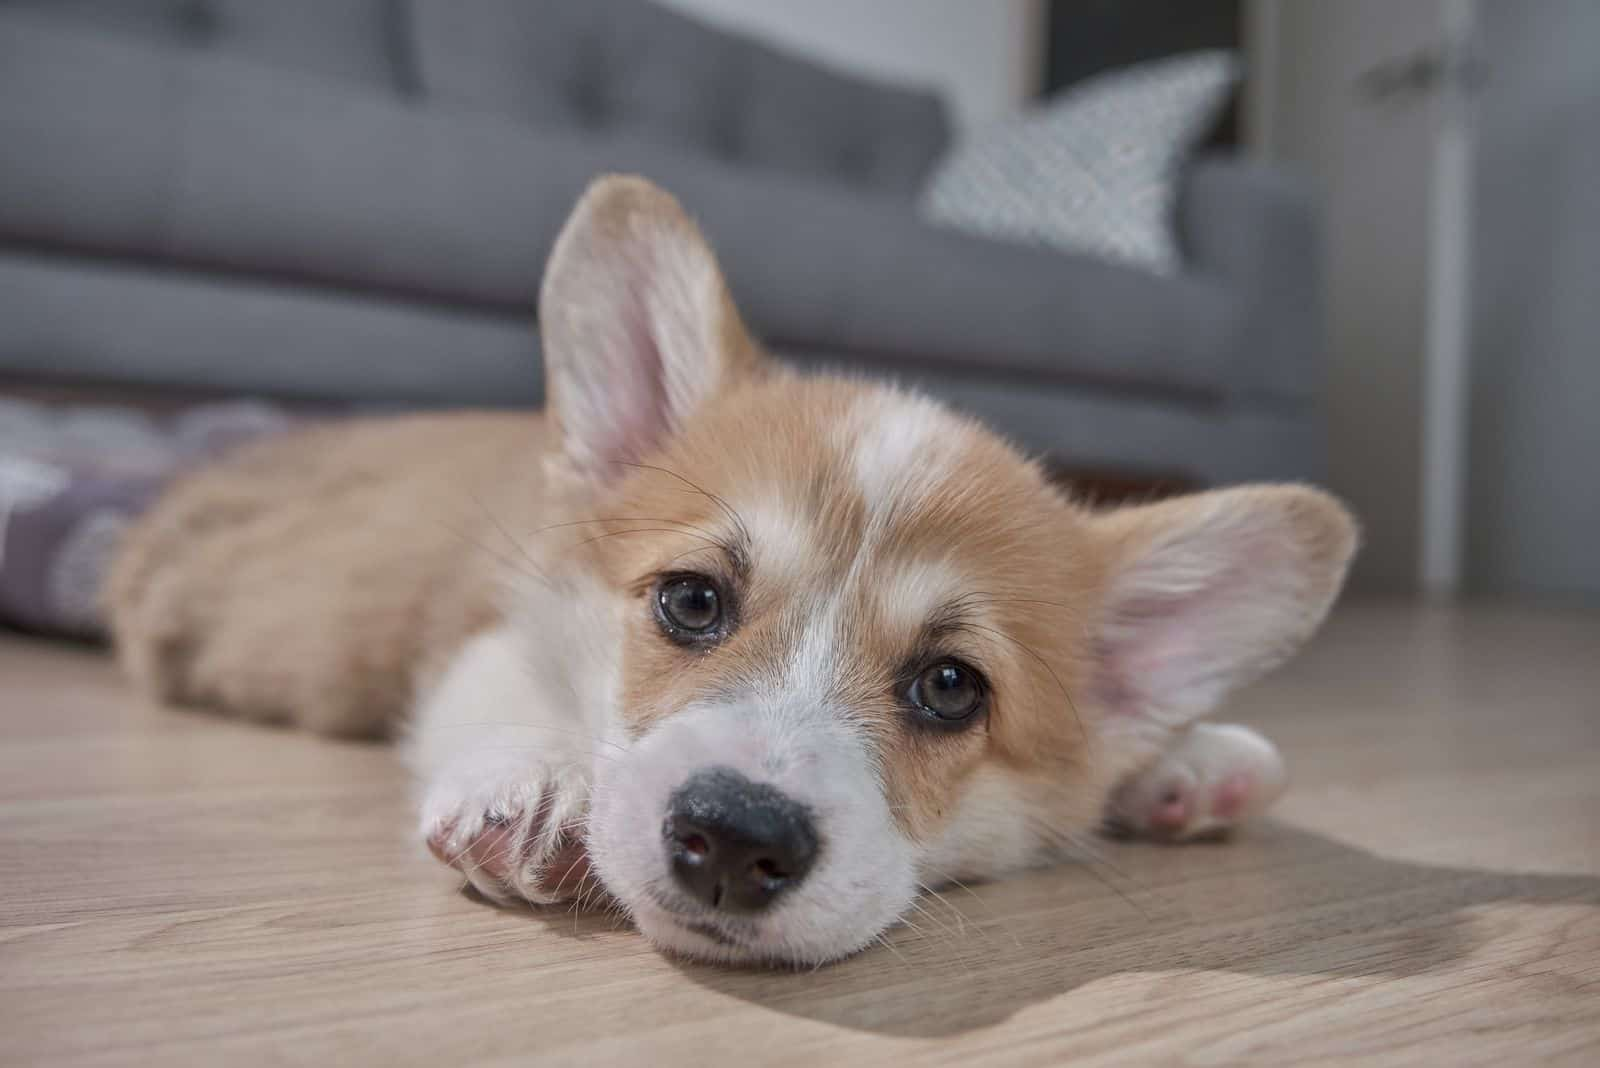 Pembroke Welsh Corgi puppy lying down on the floor